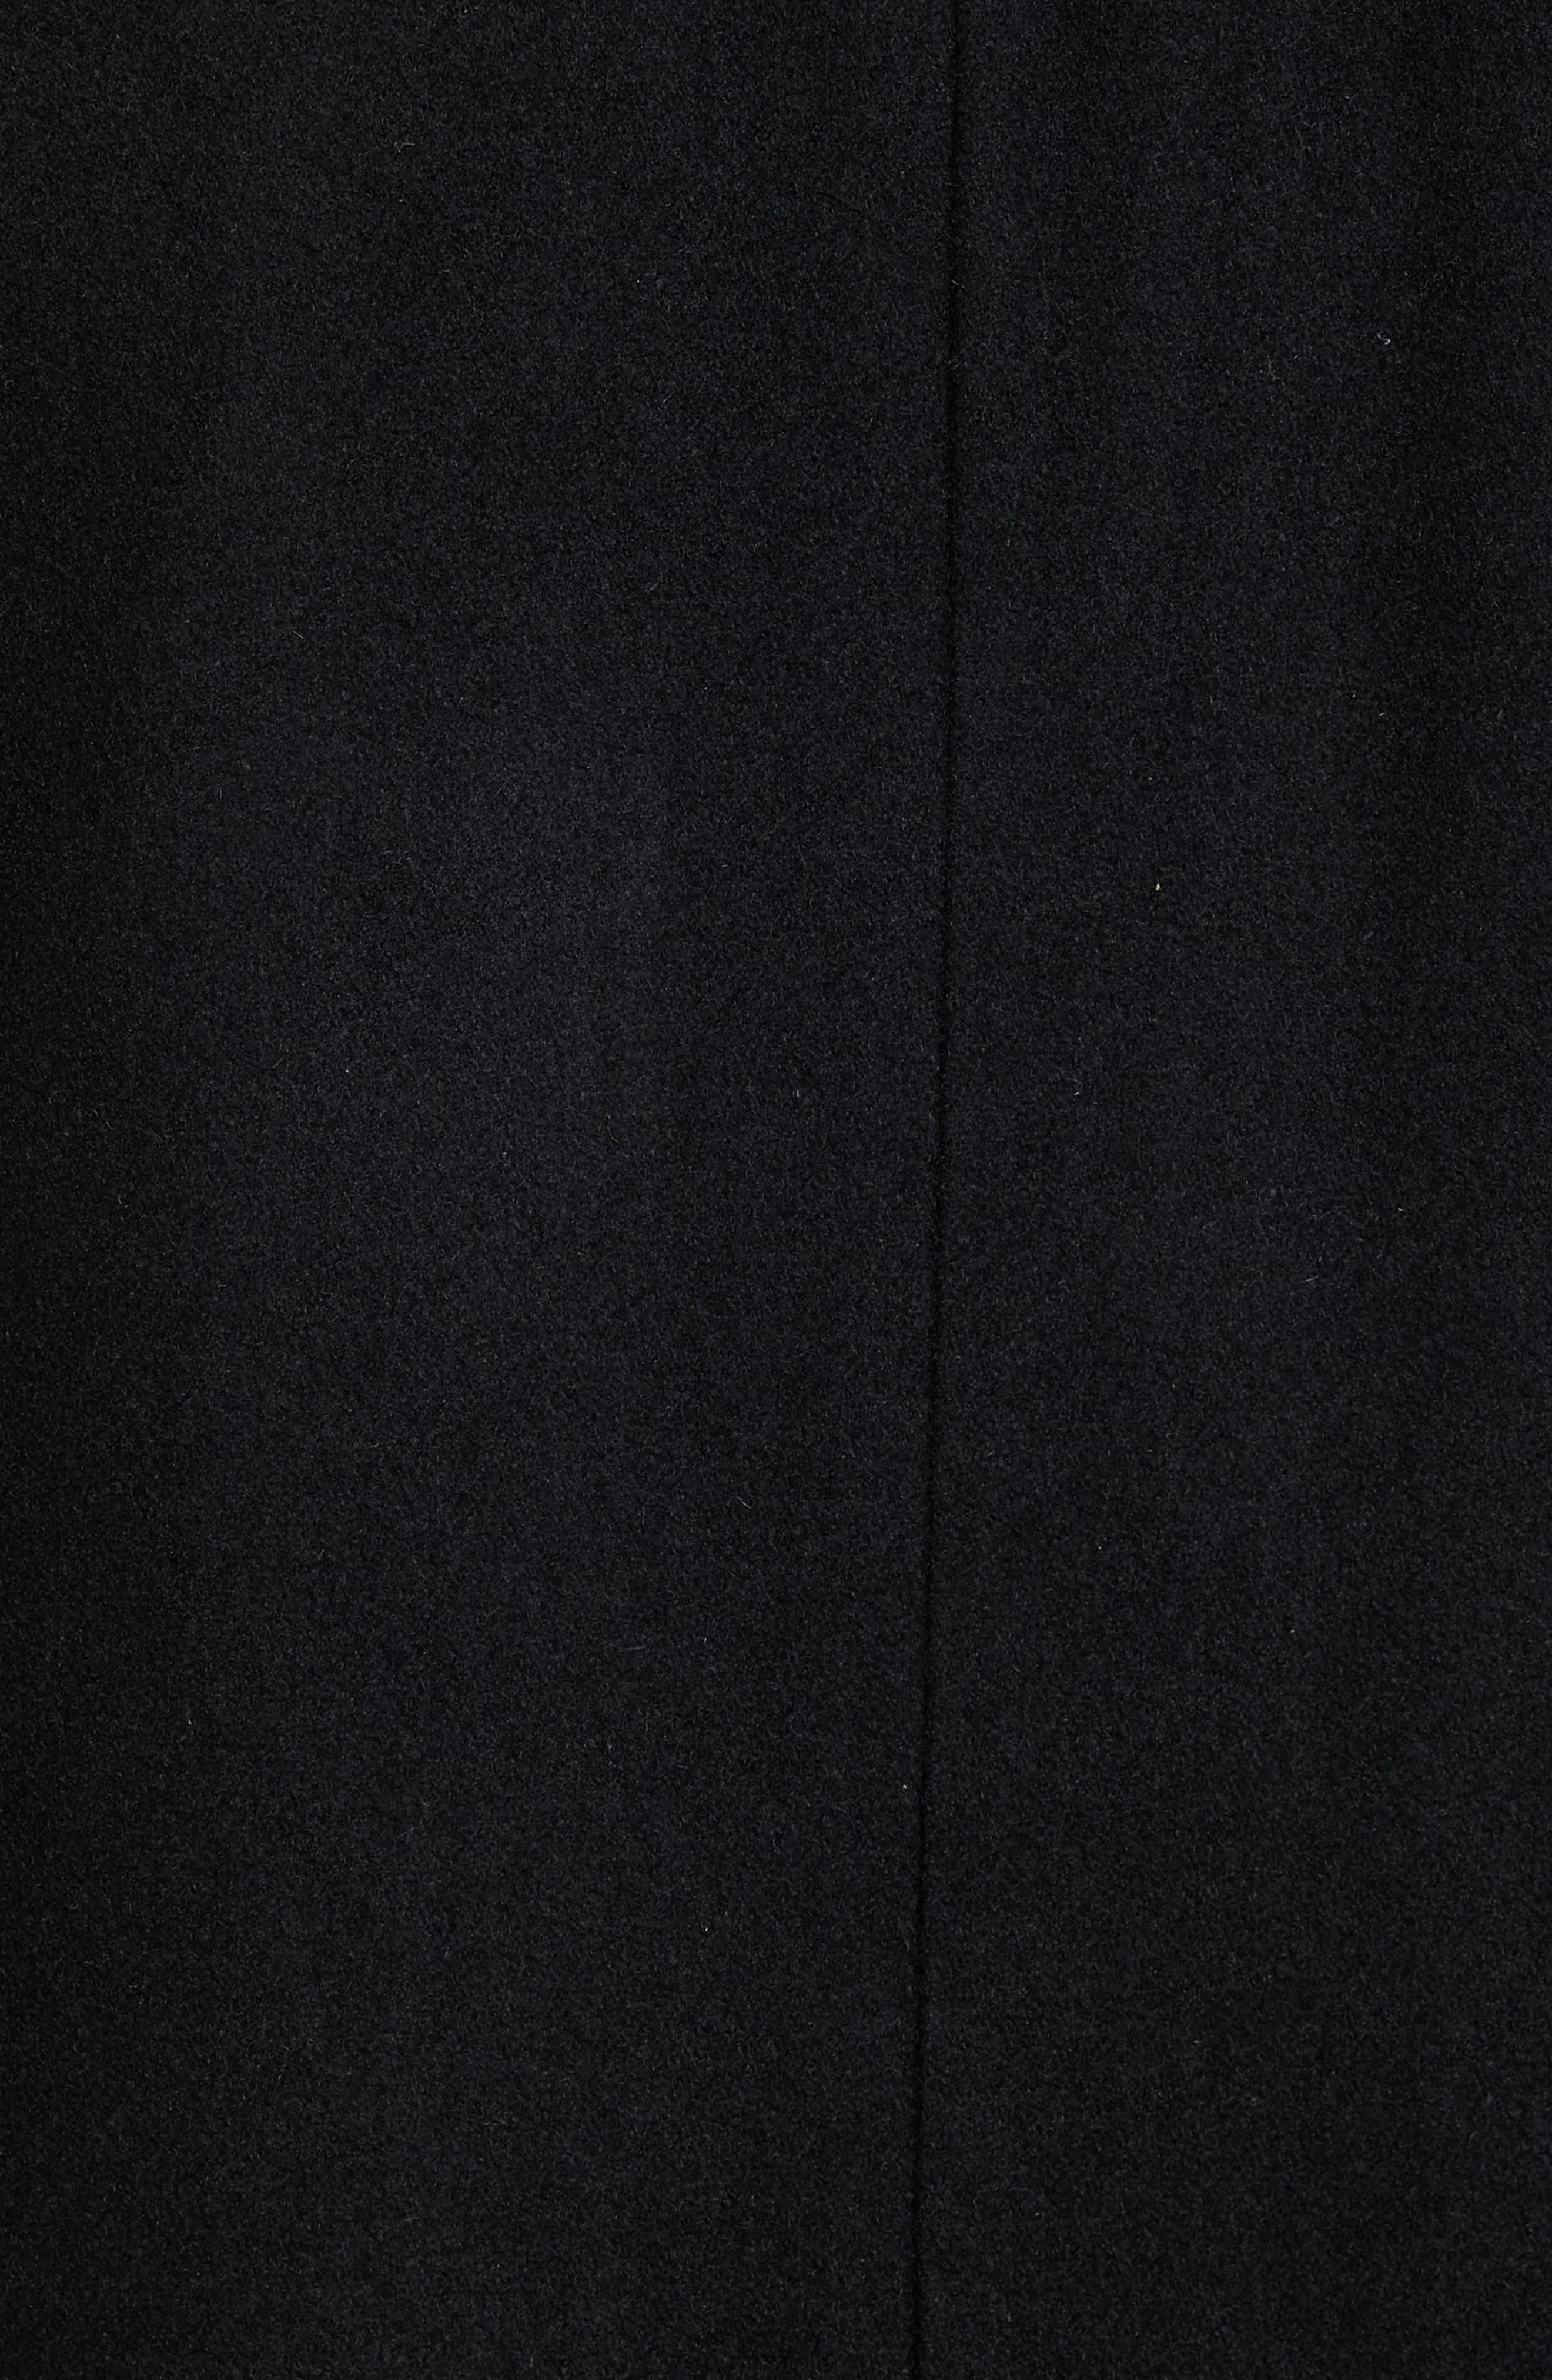 Classic Wool Blend Car Coat with Inset Bib,                             Alternate thumbnail 7, color,                             BLACK